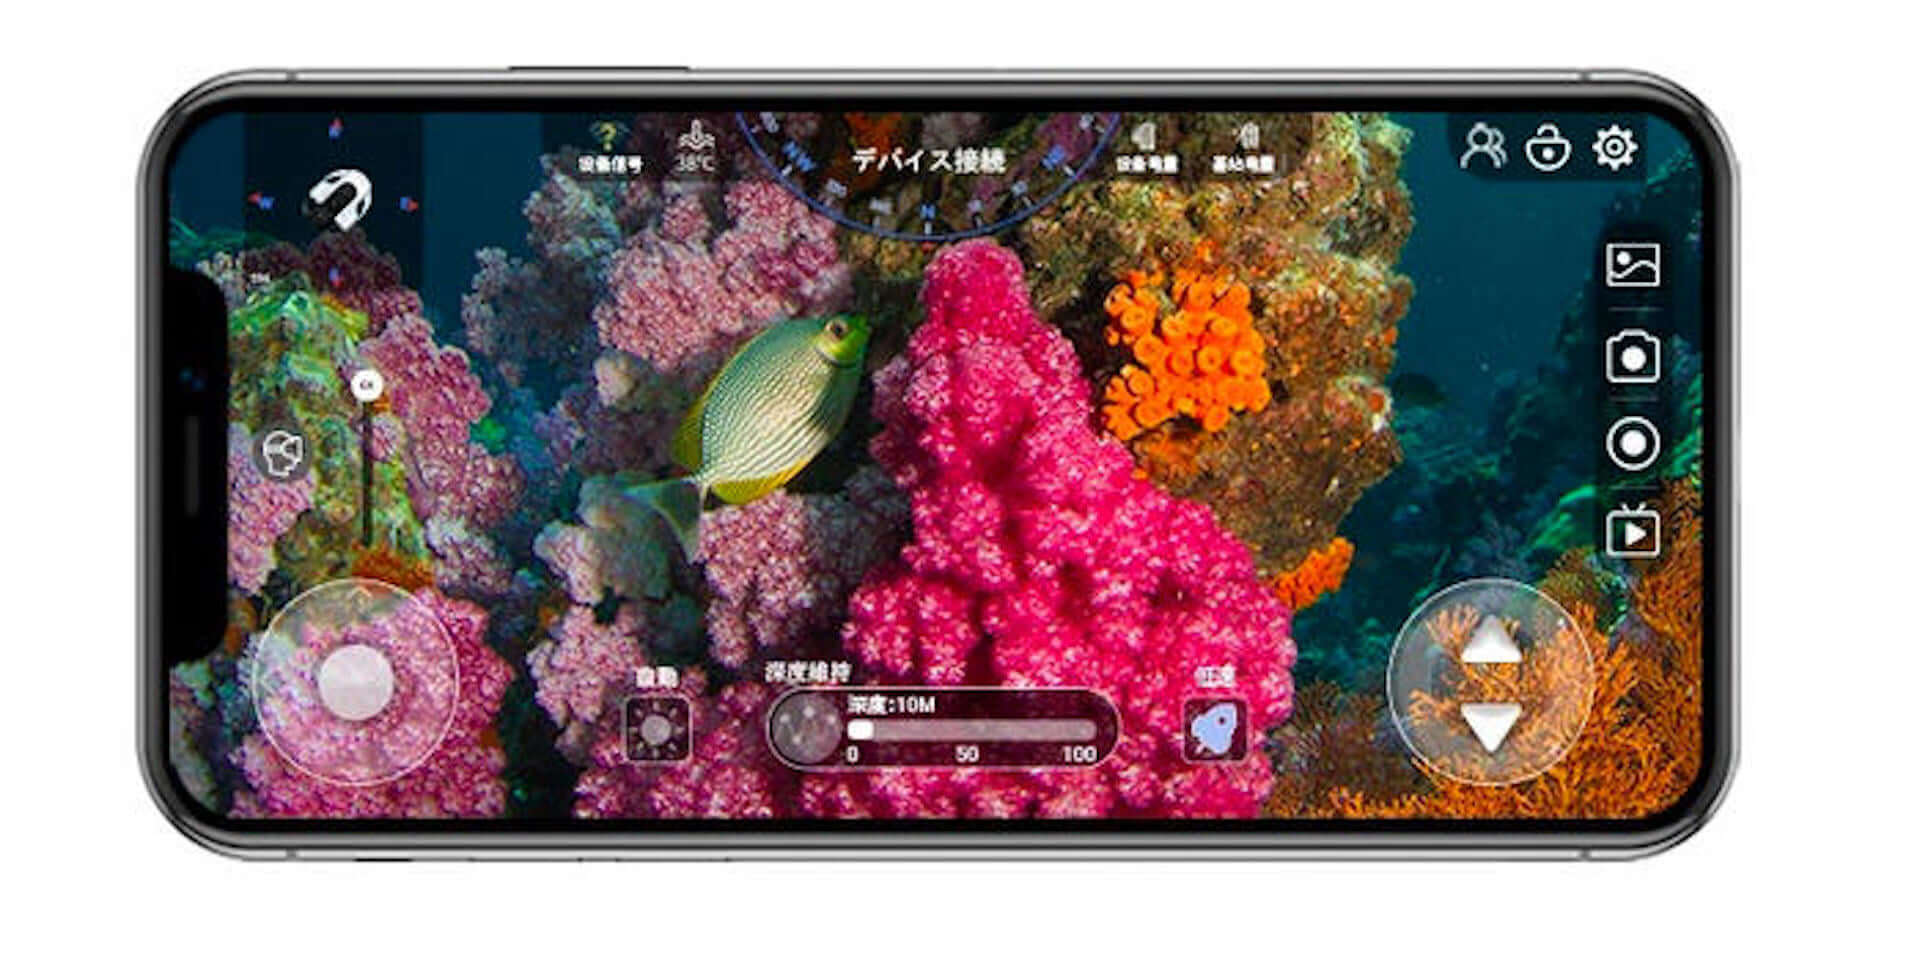 4Kカメラ&130度広角レンズ搭載の水中ドローン『BW Space Pro』がクラウドファンディングにて販売開始! tech200420_youcan_robot_4-1920x975